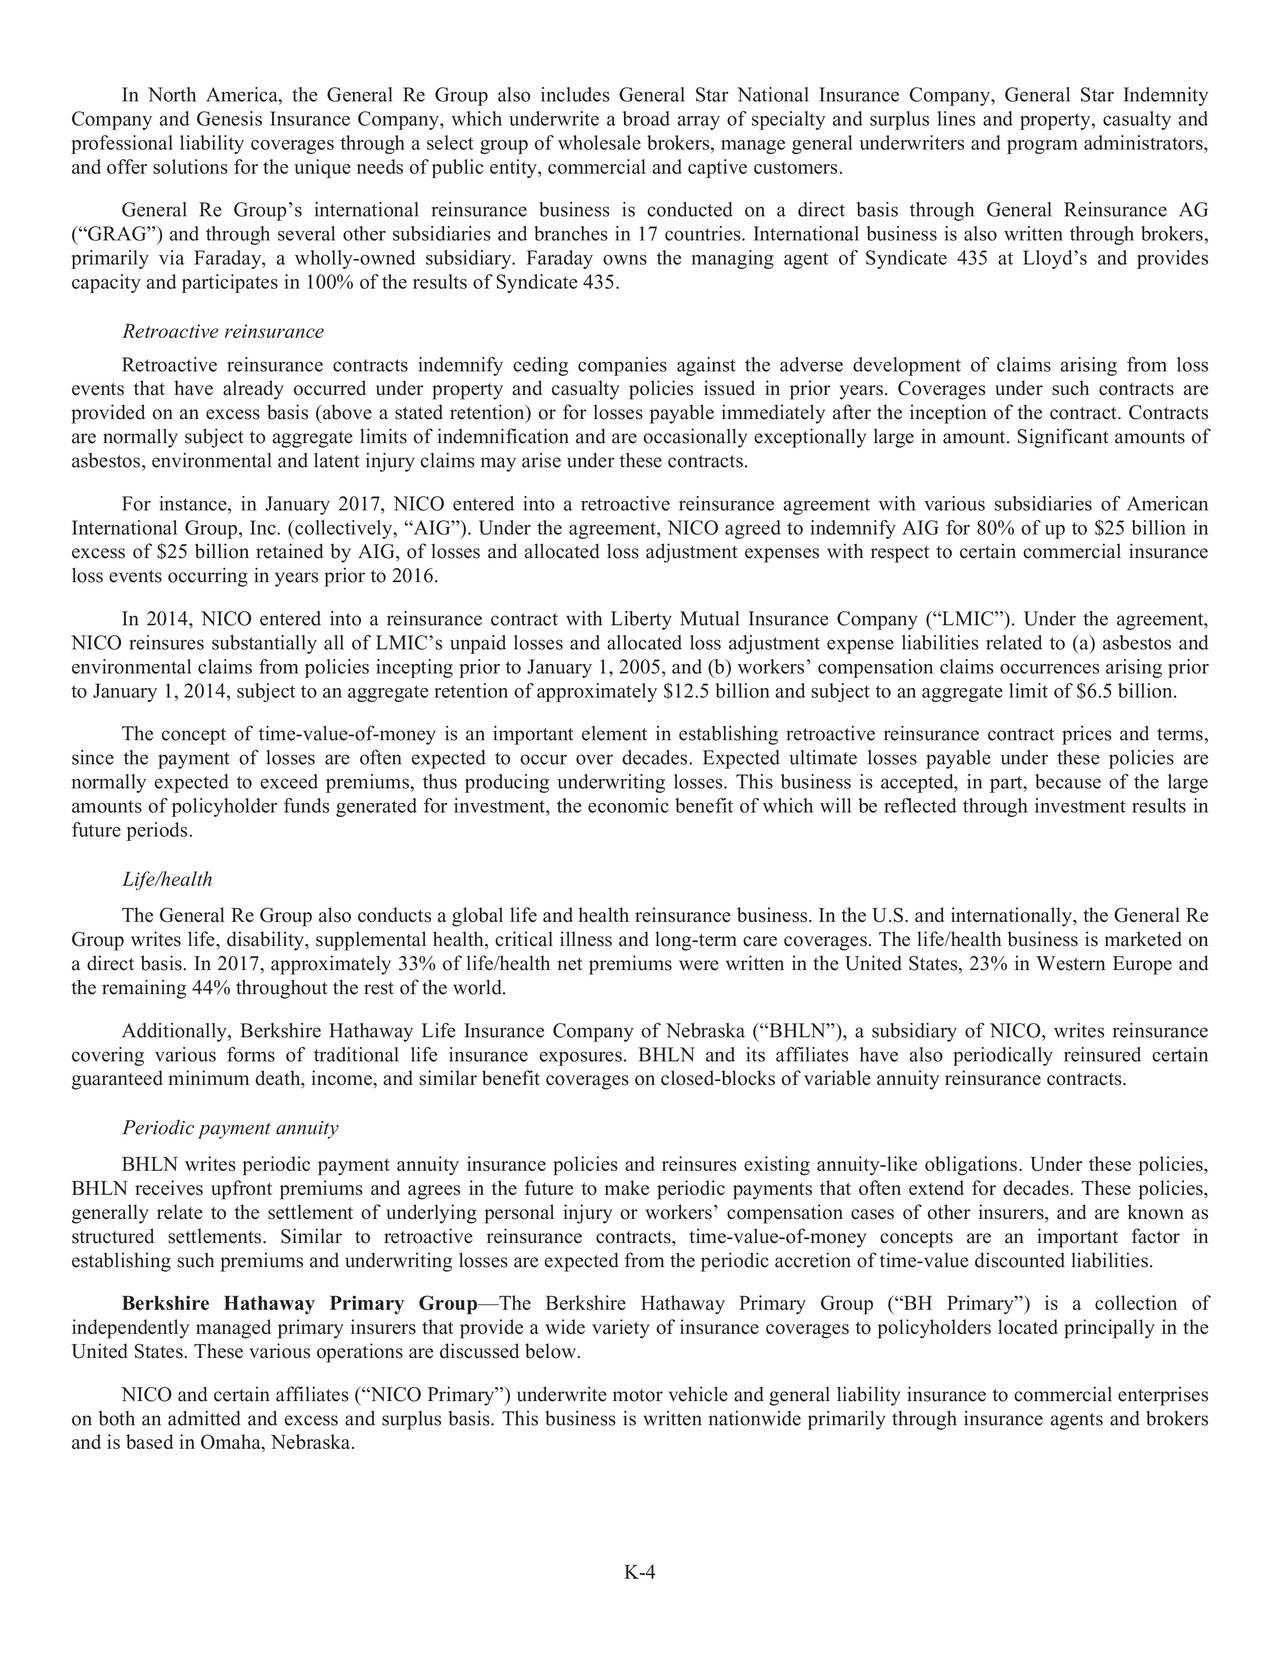 Berkshire Hathaway 2017 Annual Letter  Berkshire Hathaway A NYSE:BRK.A  Seeking Alpha